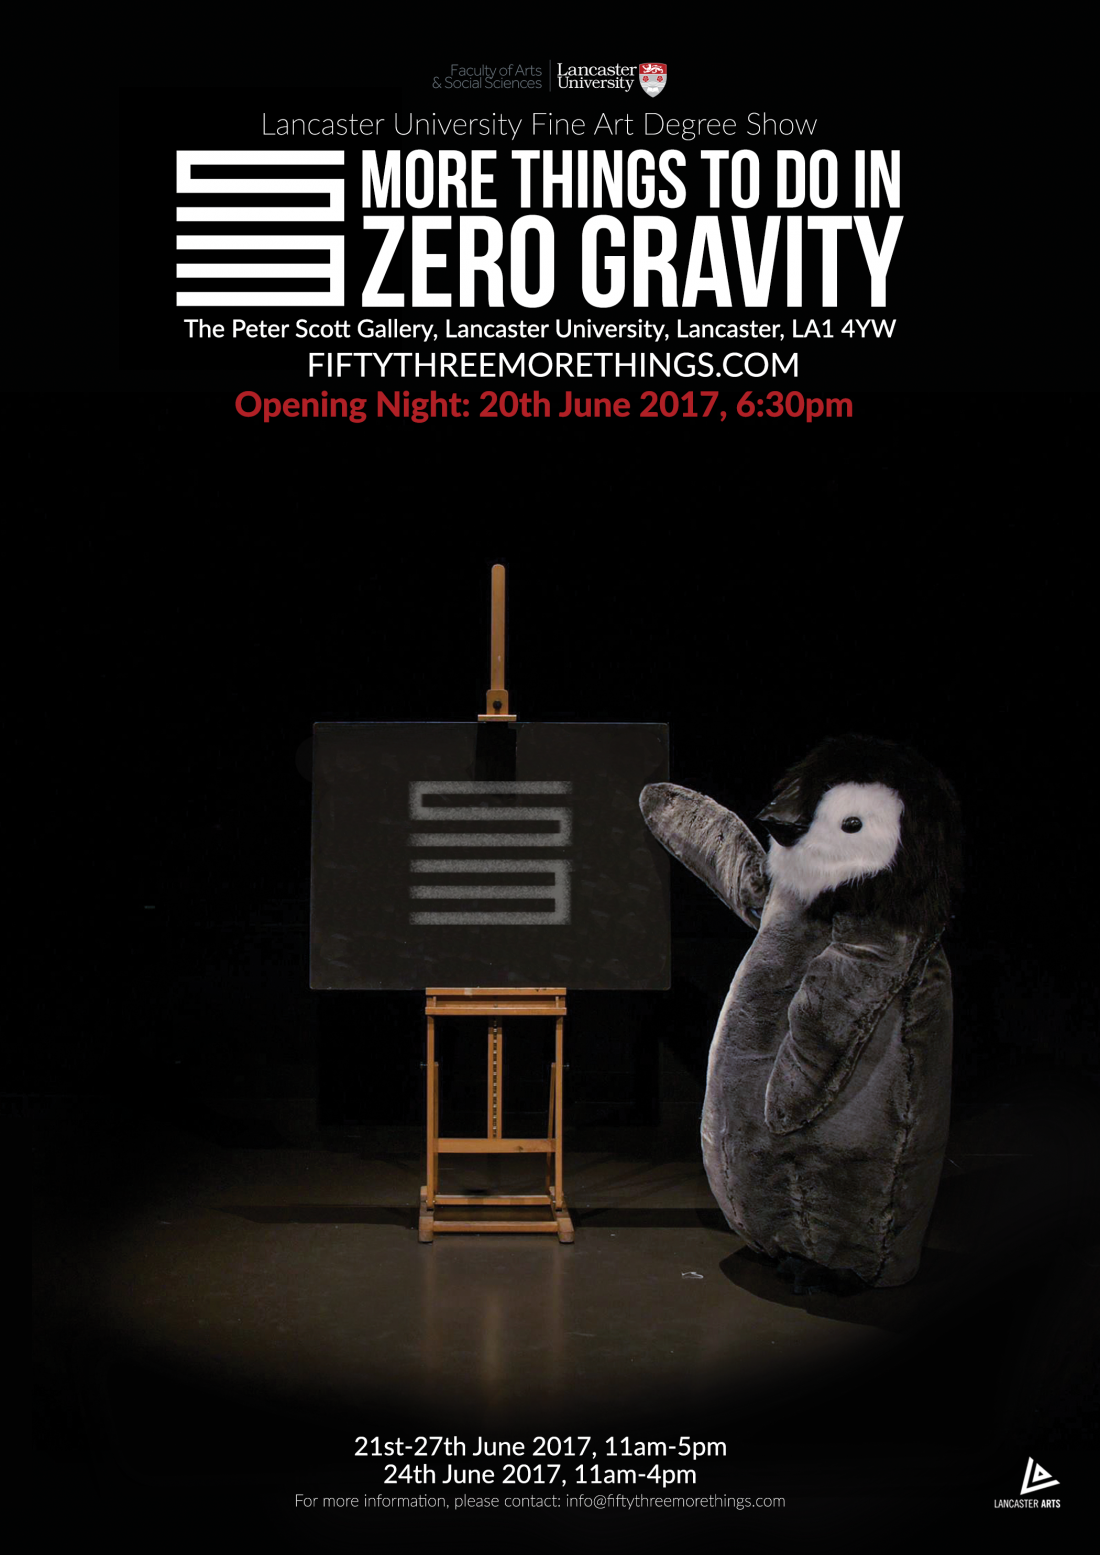 LU Fine Art Degree Show 21-27 June 2017 at Lancaster University's Peter Scott Gallery